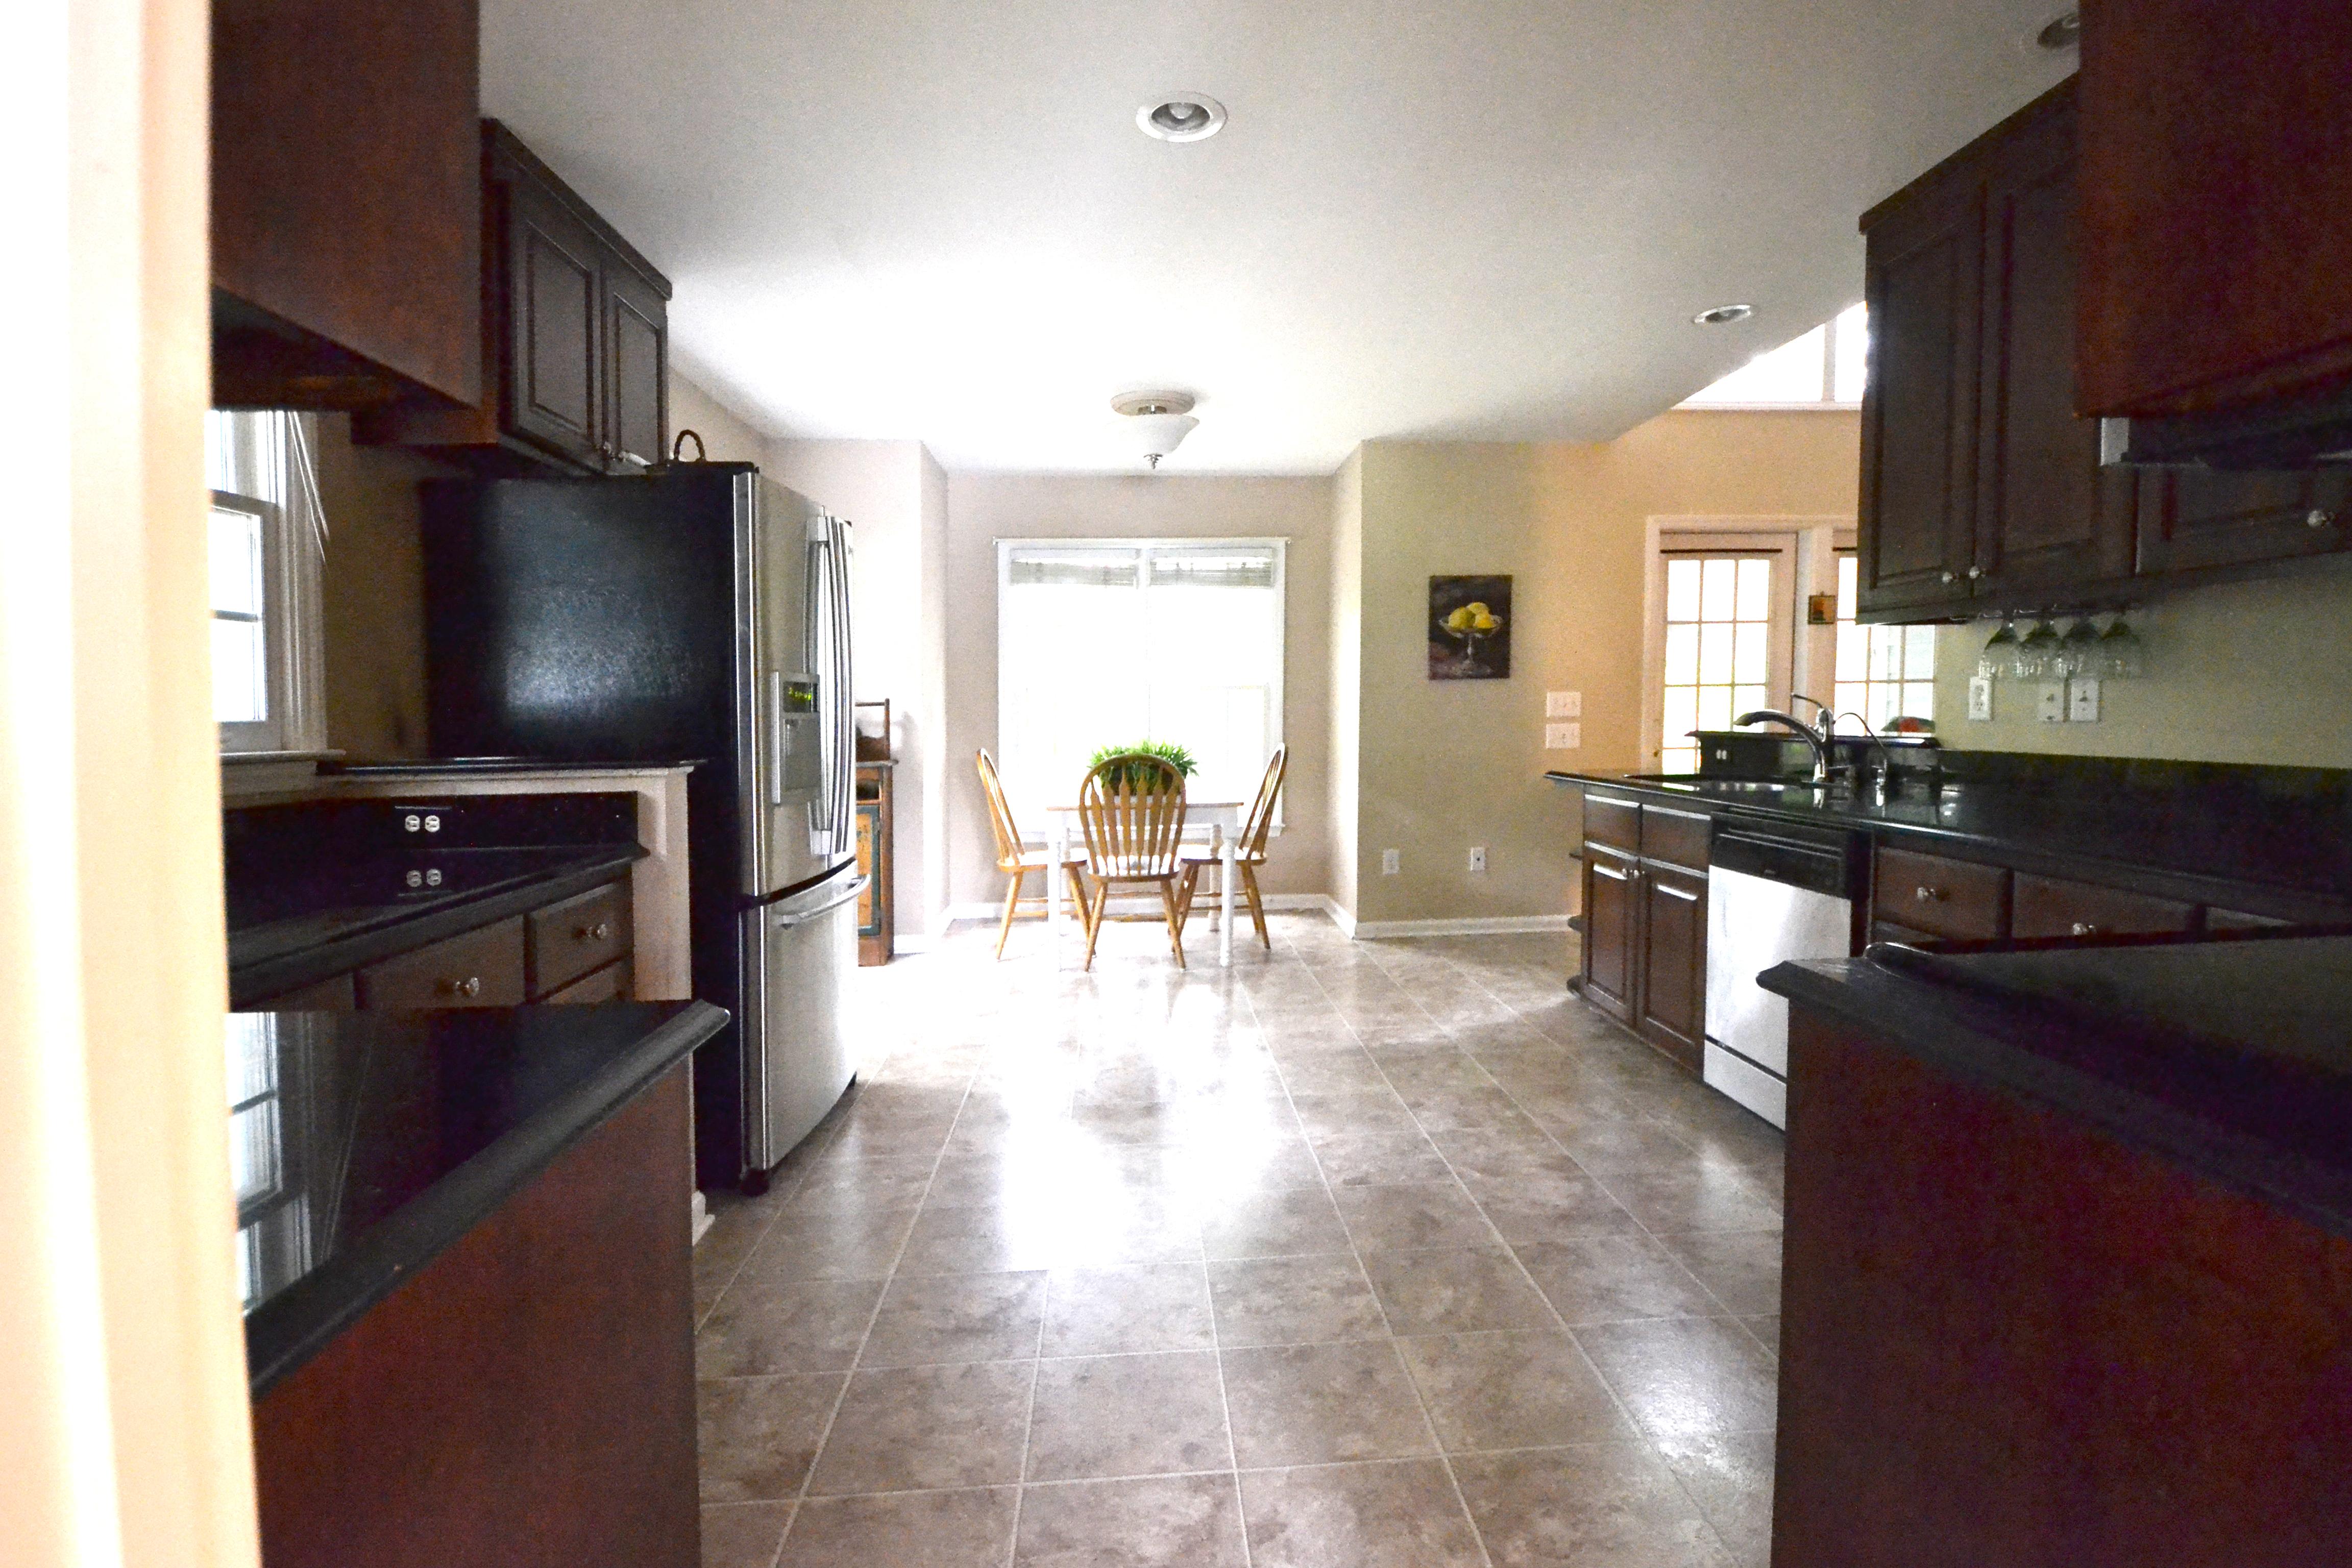 Solid Wood Cabinets & Granite